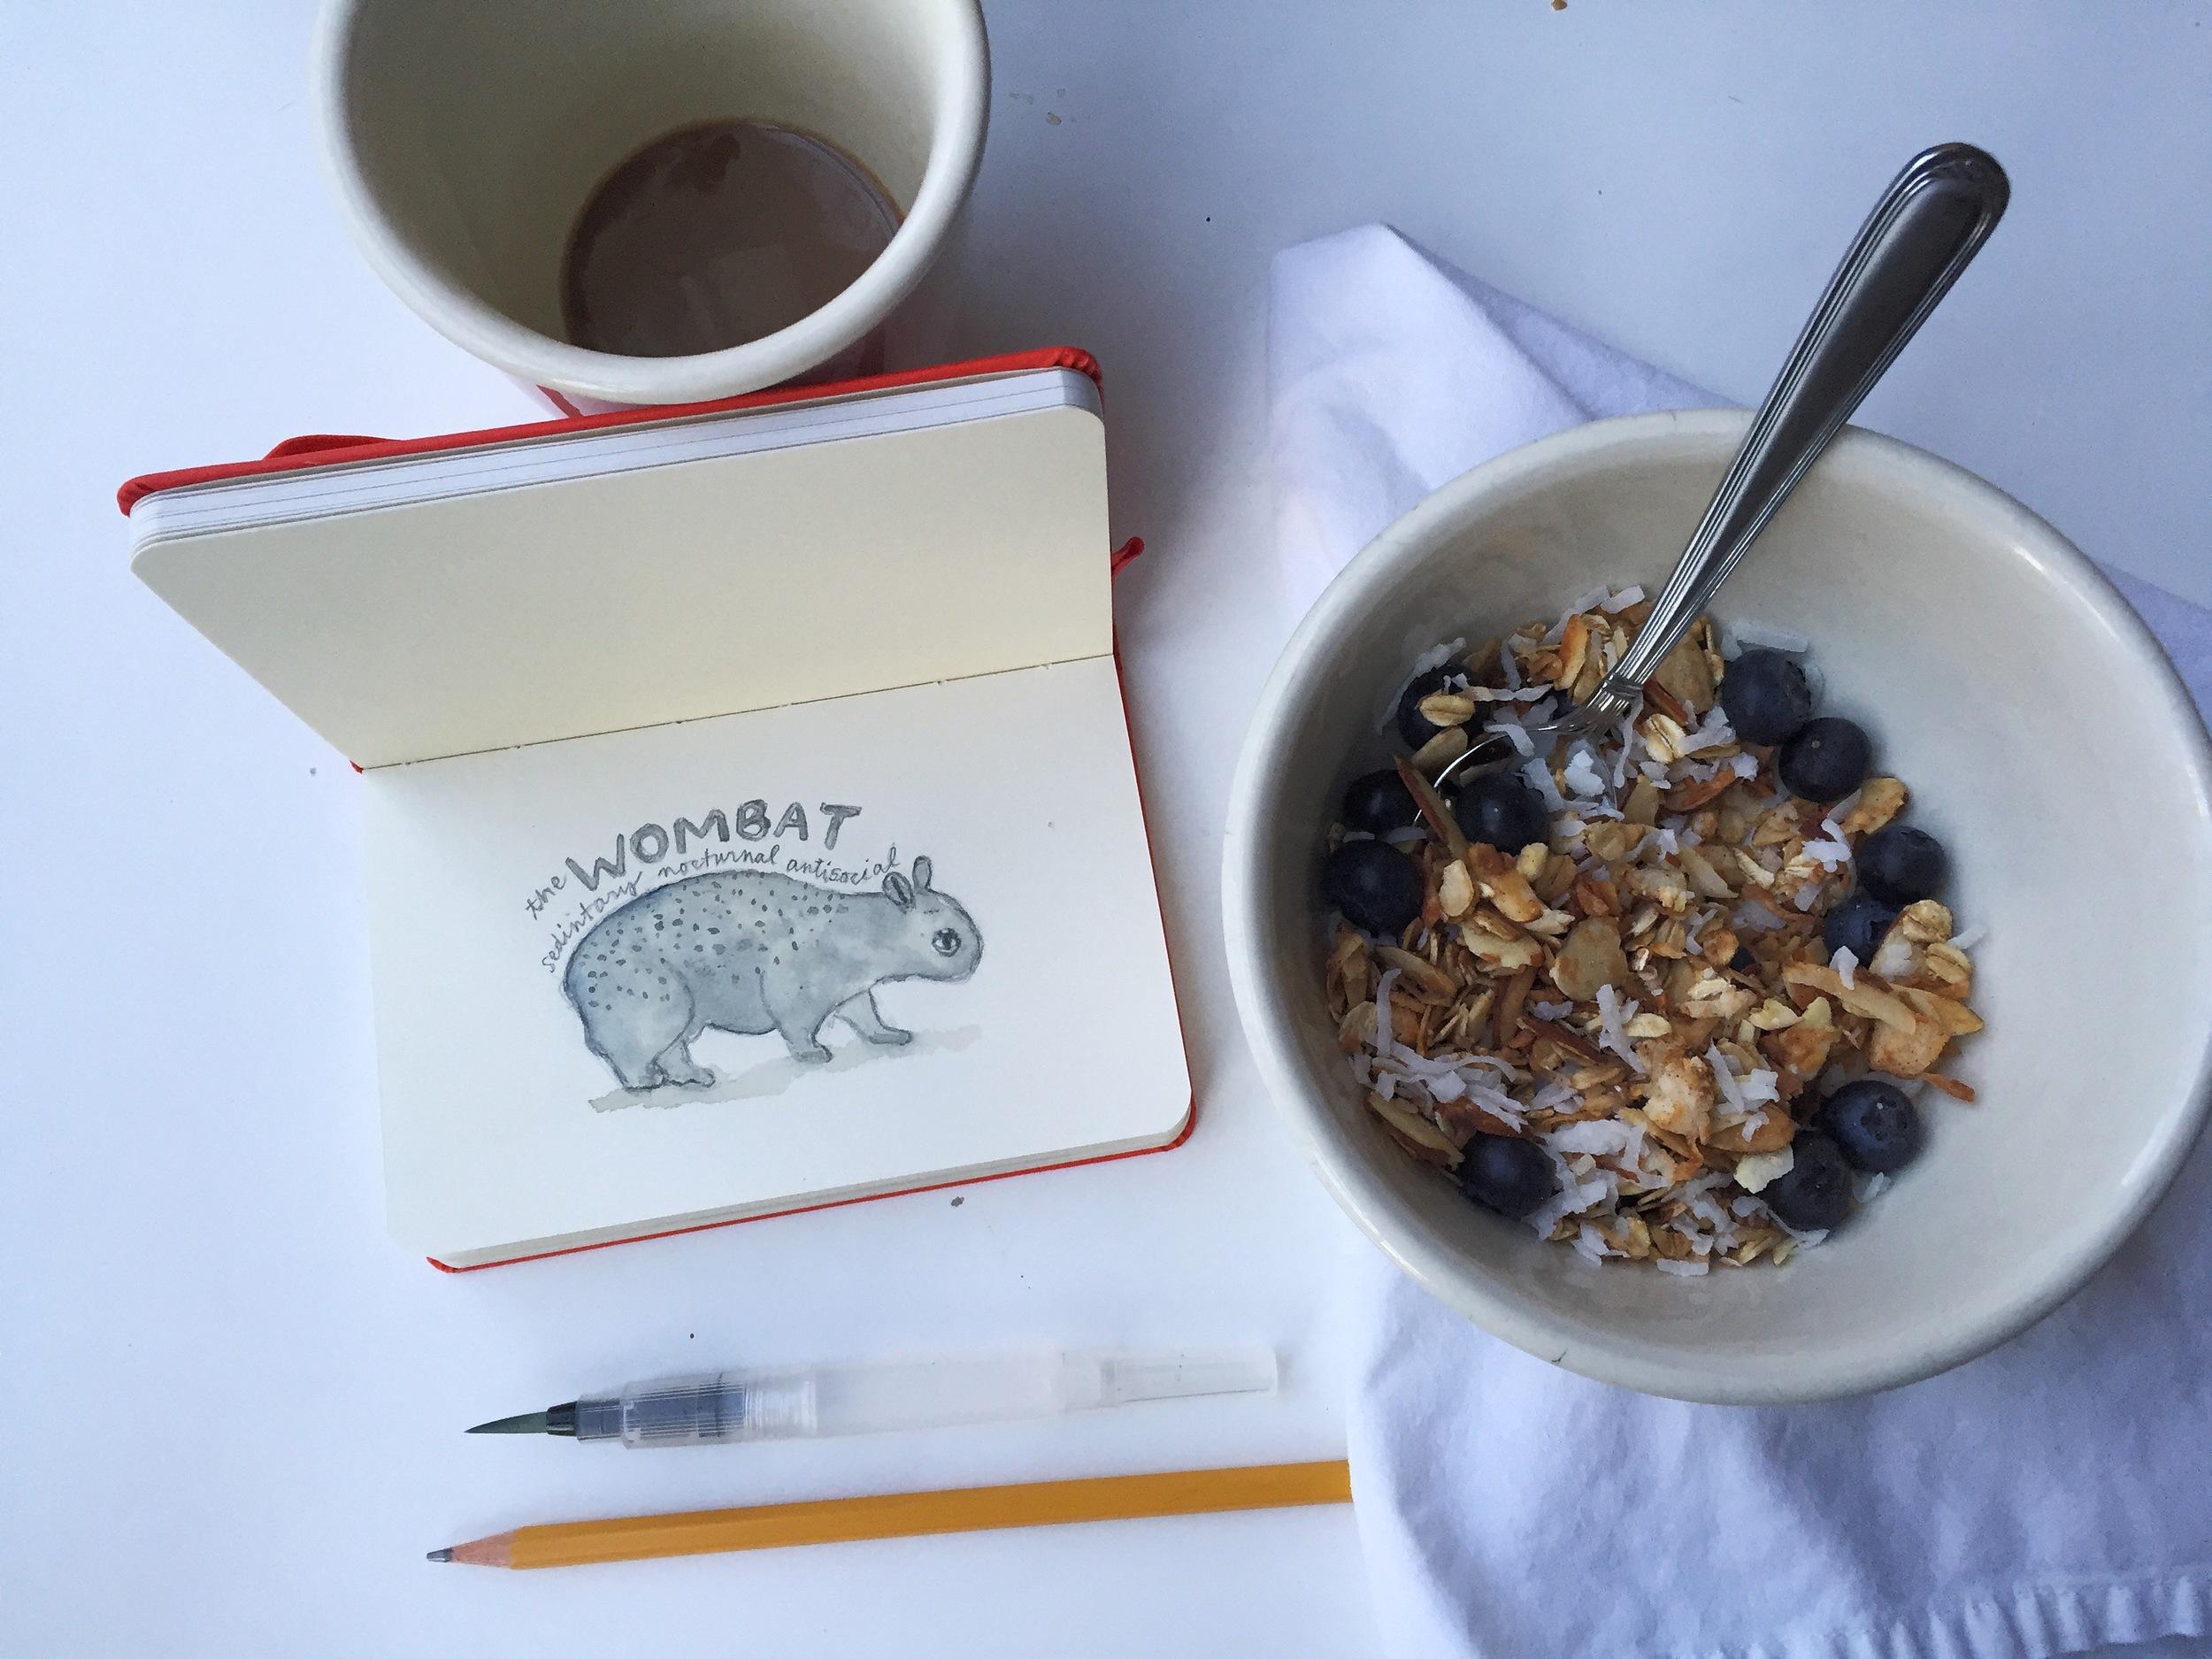 wombat | year of creative habits